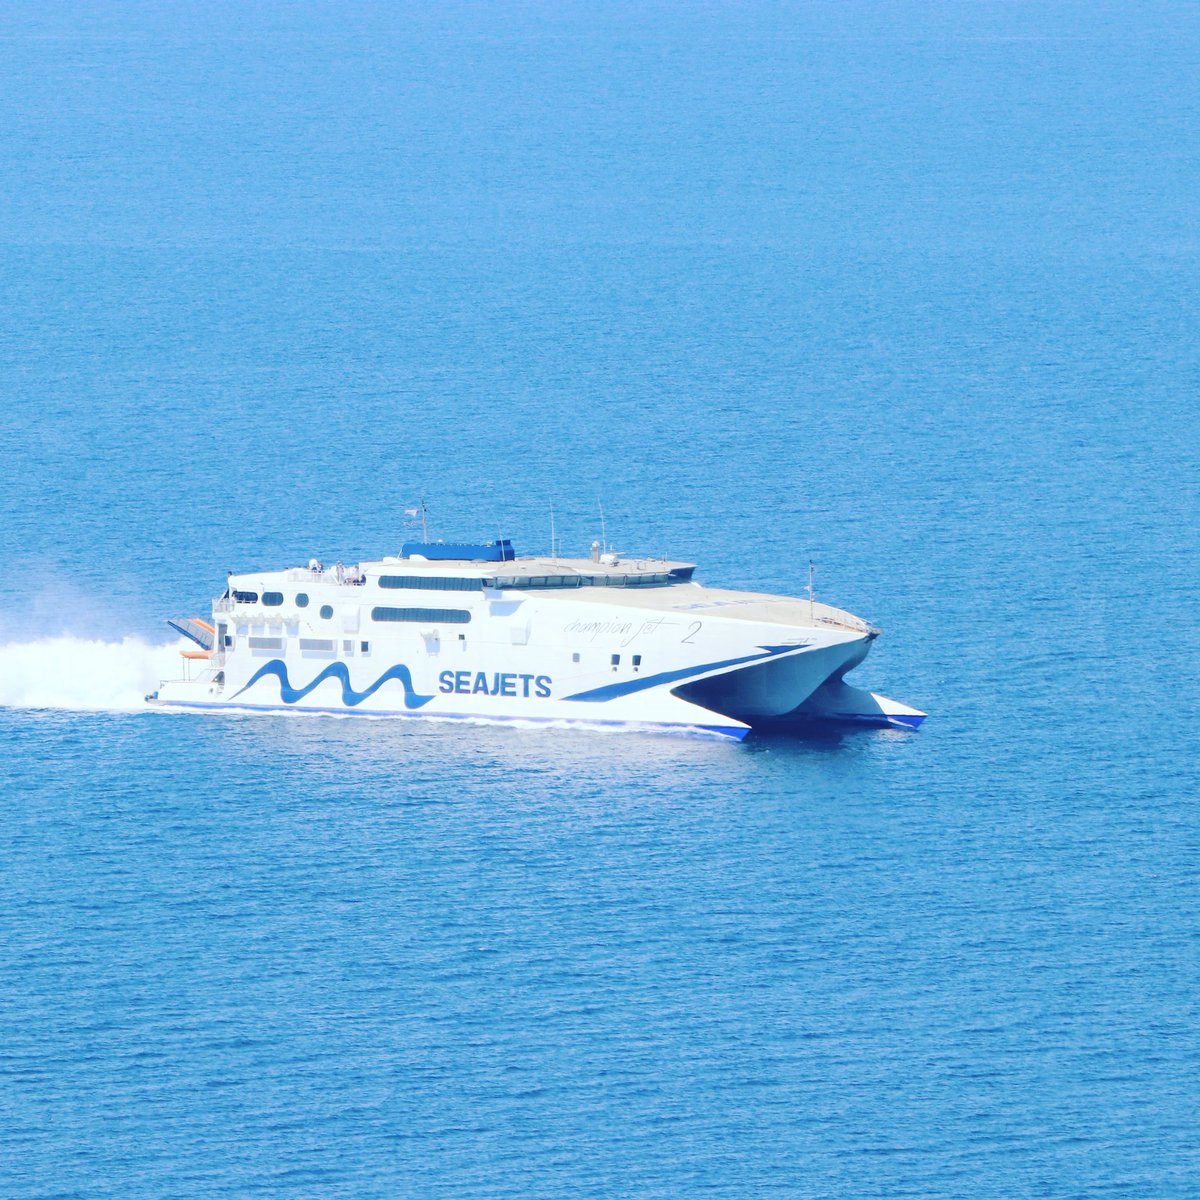 Fast ! #astraeusholidays #holidays #Greece #Naxos #summer #Travel #islandhopping #vacation #seajets #cyclades #Wednesdaypic.twitter.com/uyCv29gATm